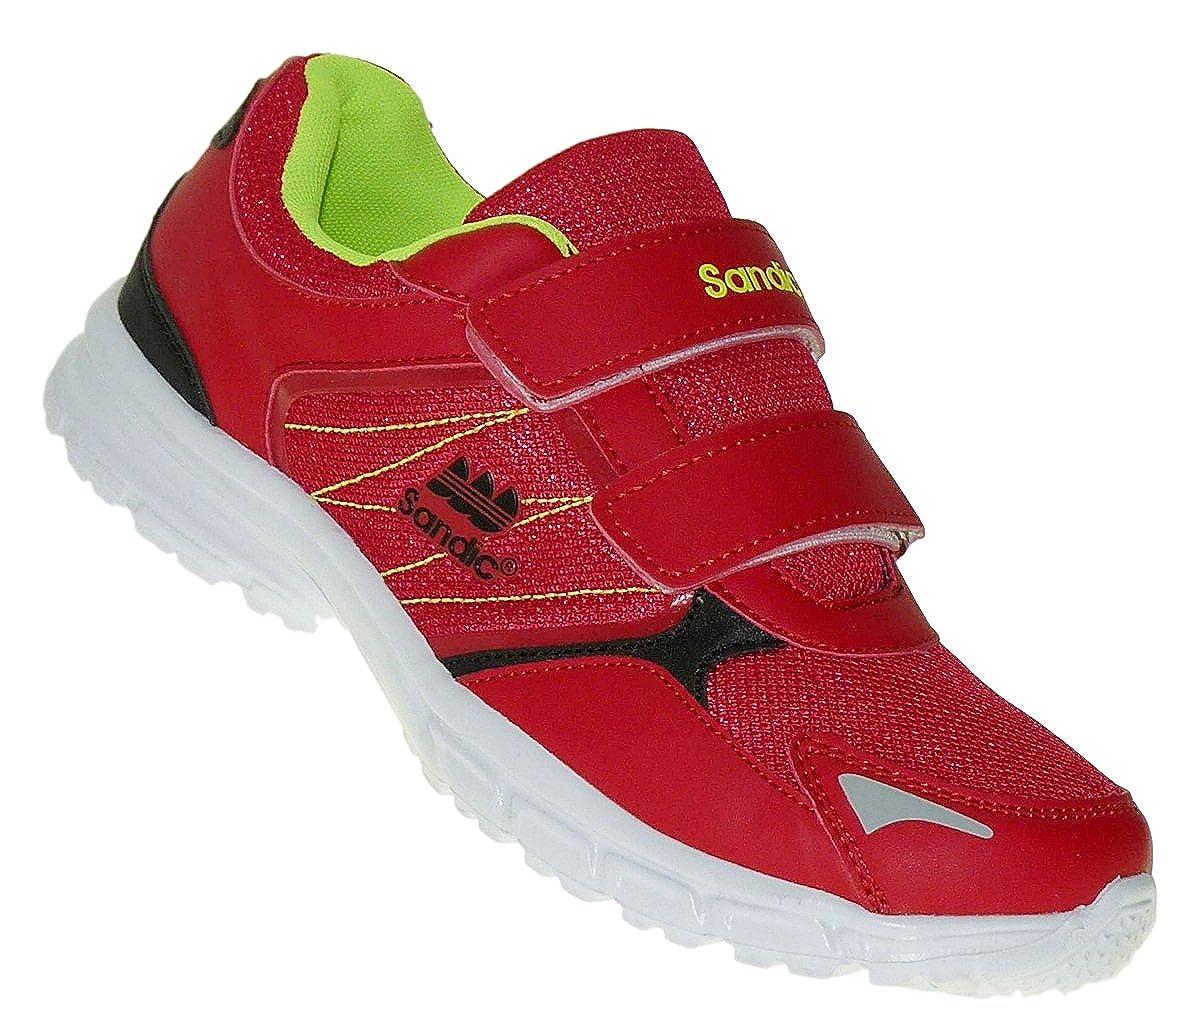 Bootsland 913 Neon Turnschuhe Sneaker Sportschuhe Herren